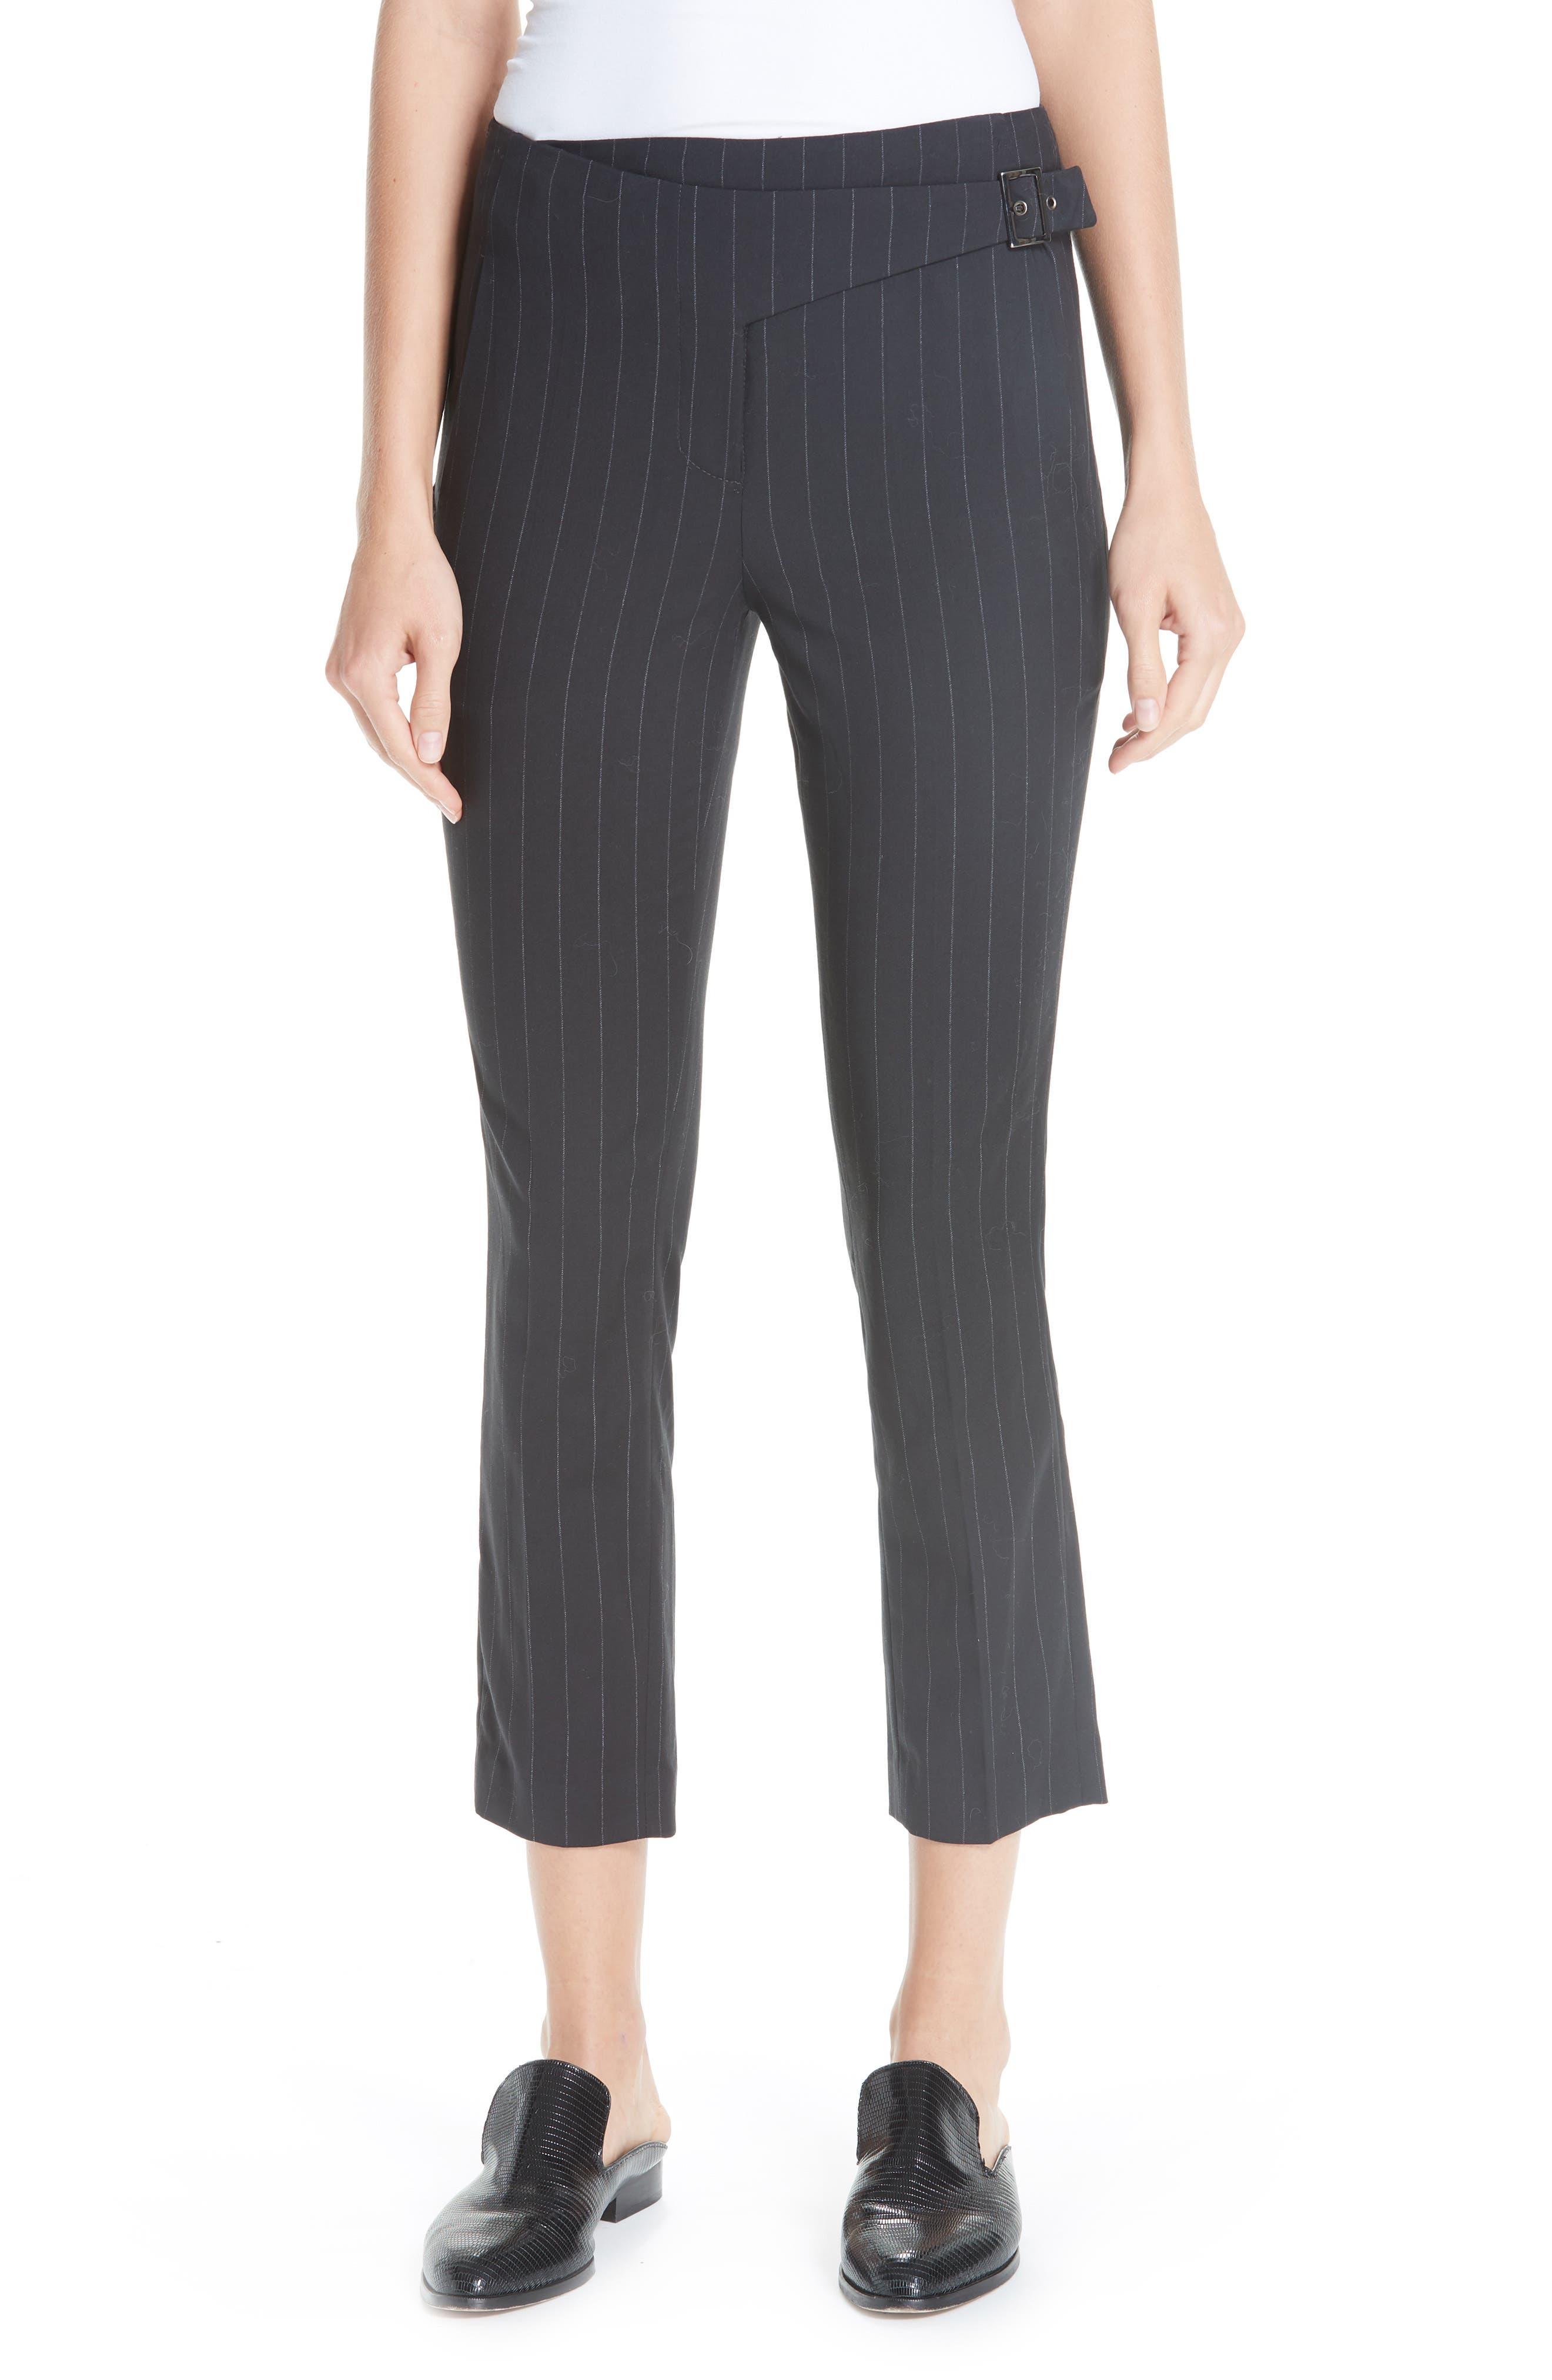 Bango Pinstripe Crop Trousers,                             Main thumbnail 1, color,                             001